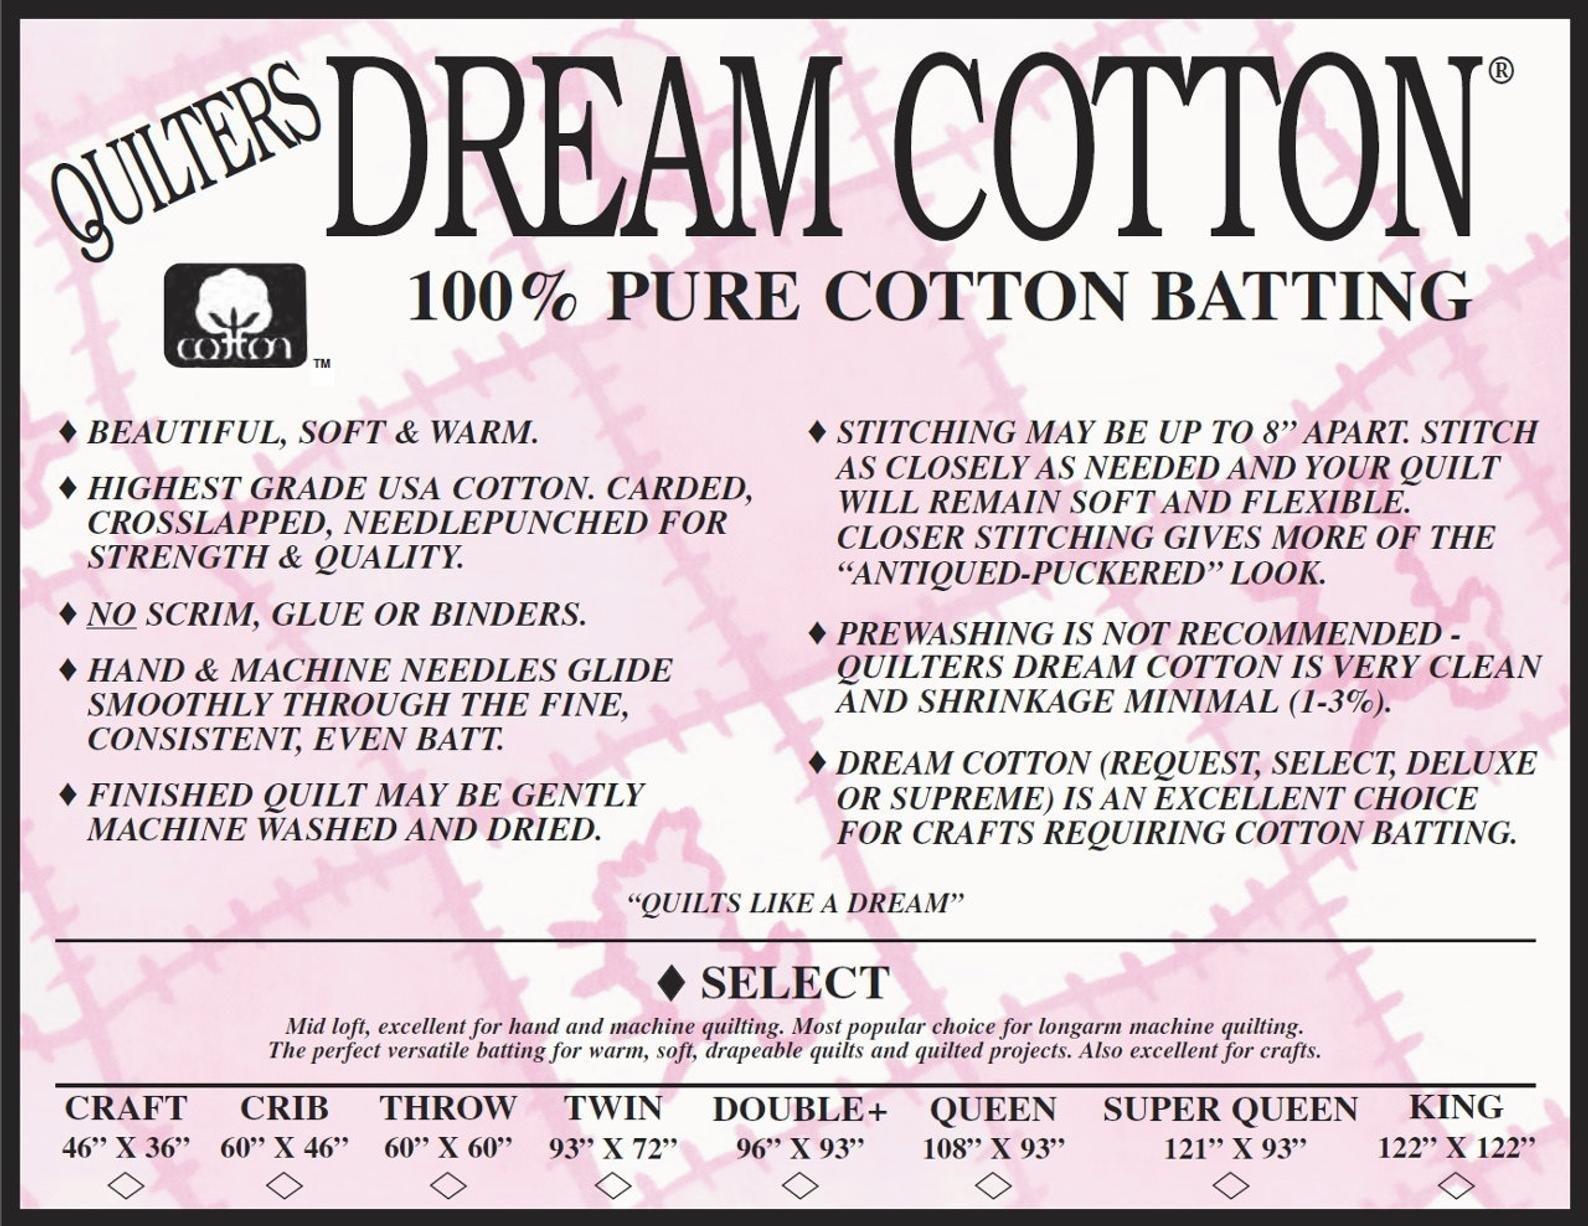 Quilters Dream 100% Cotton Natural Select - Mid Loft Batting